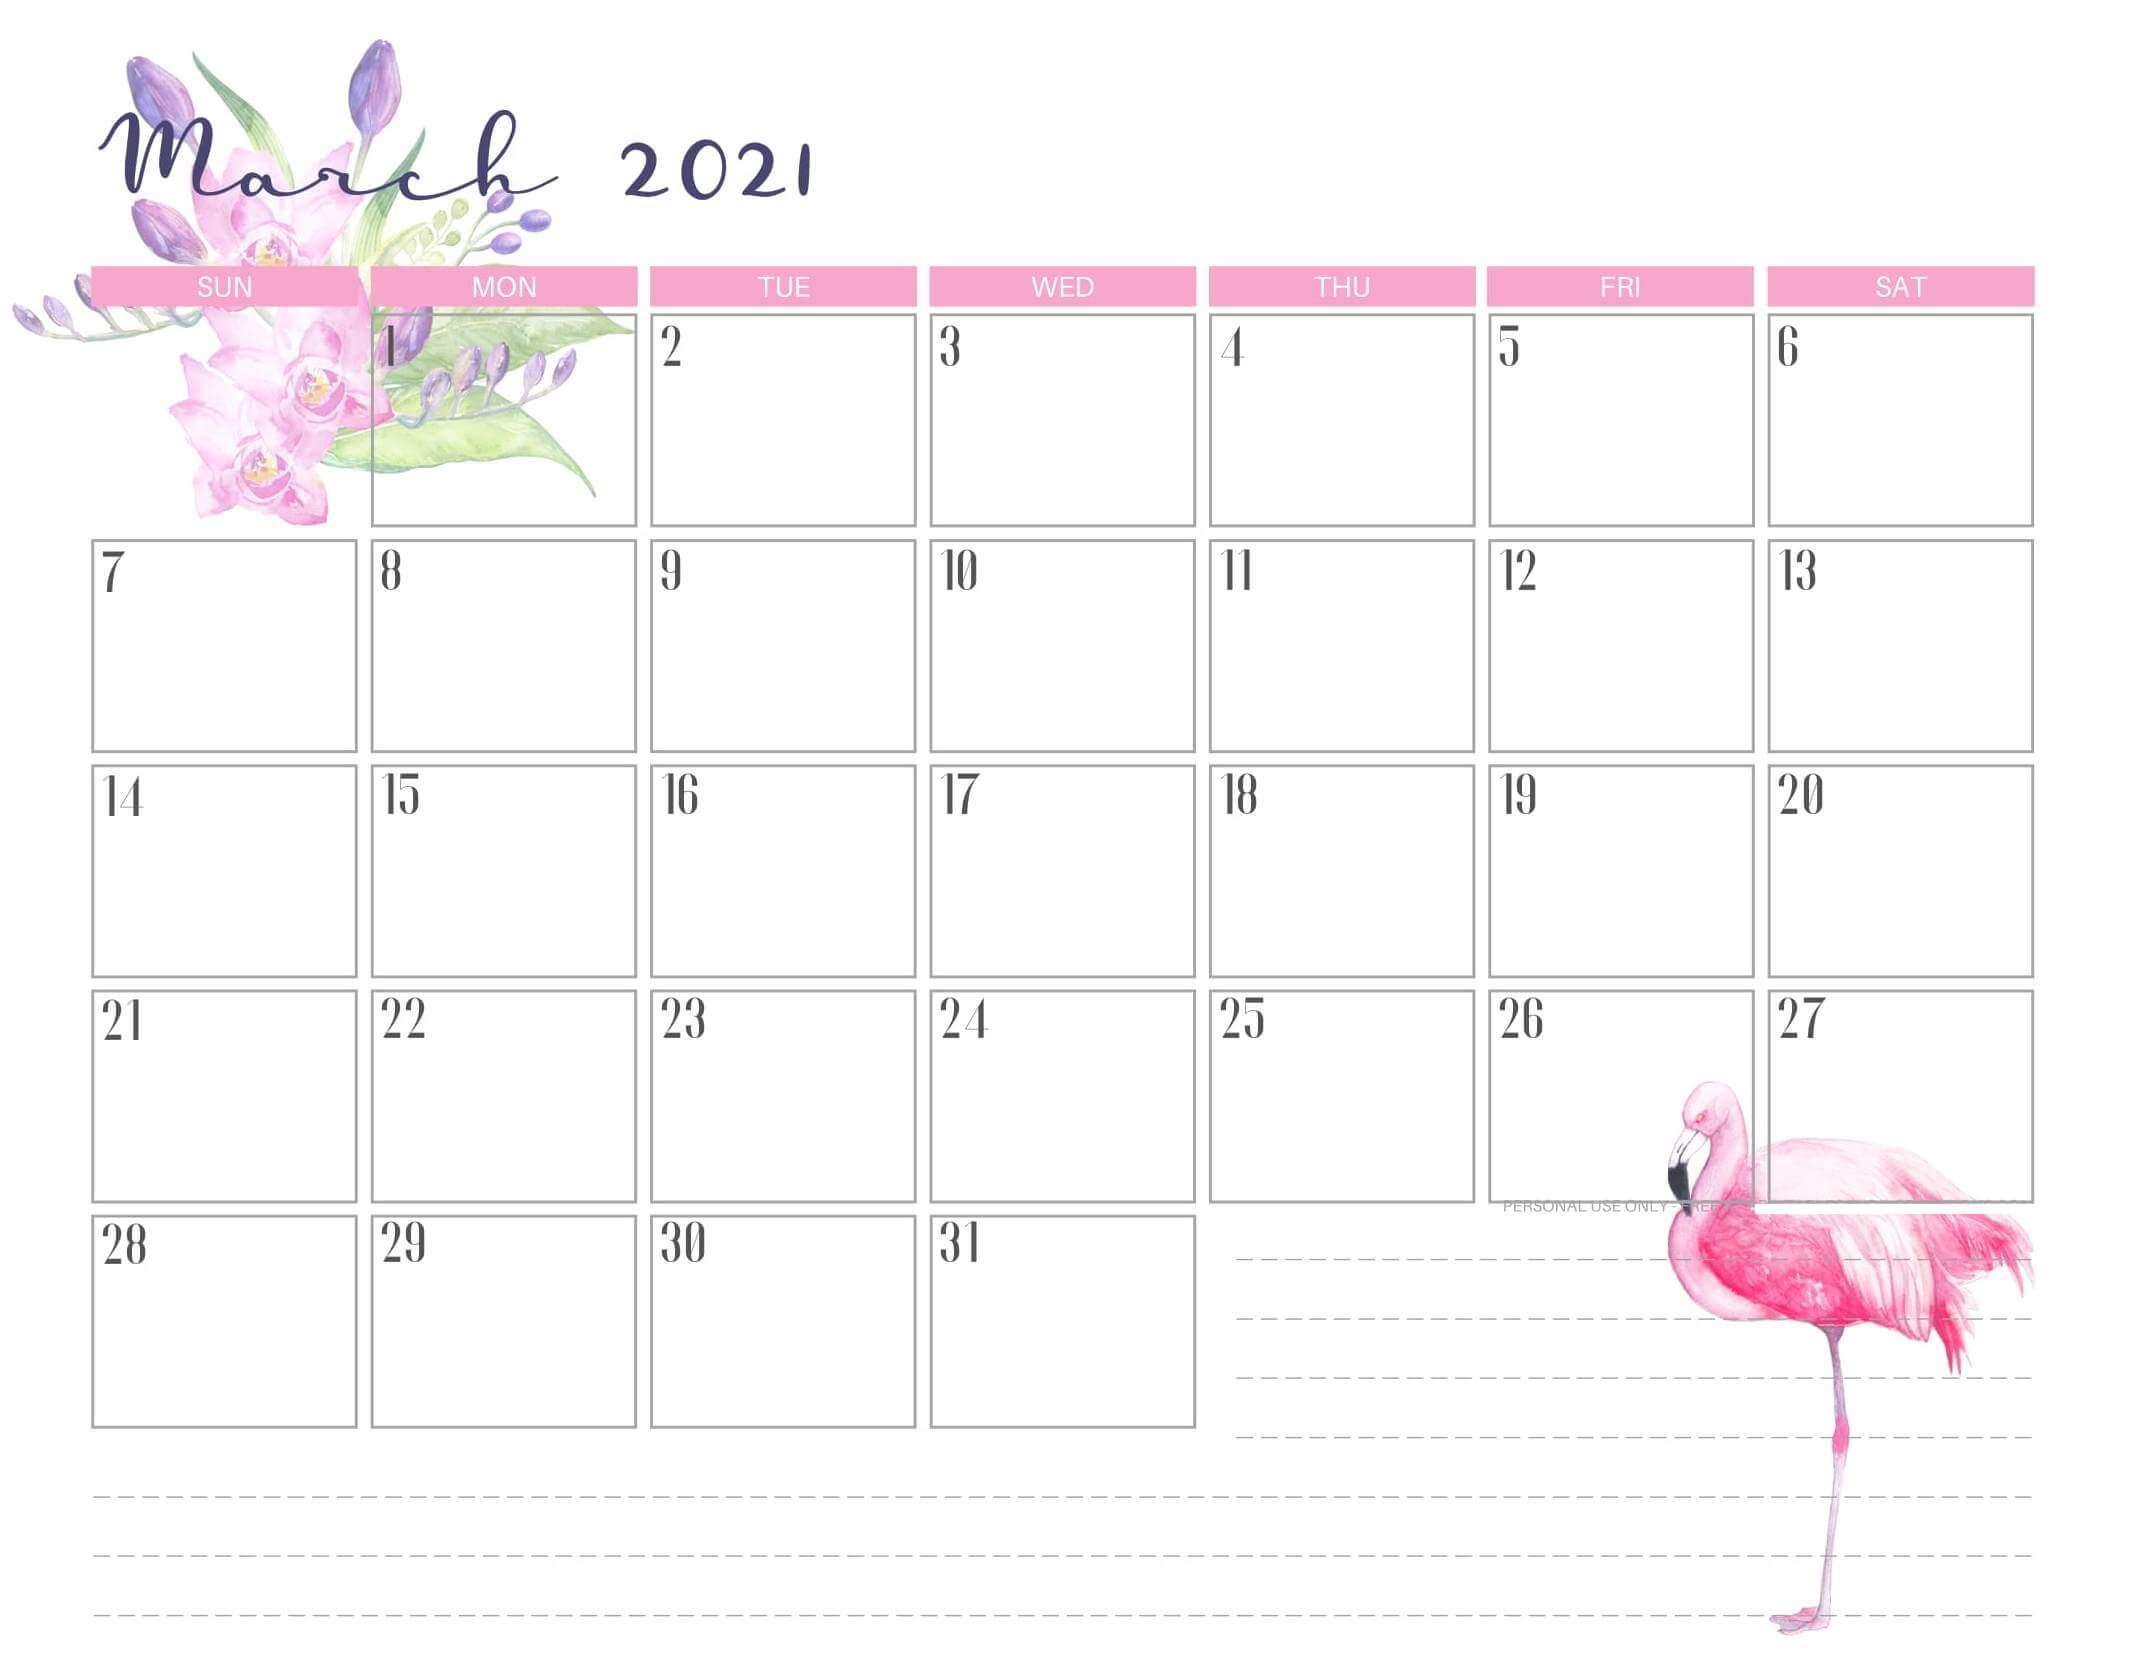 Printable Cute March 2021 Calendar Template Images Set 4